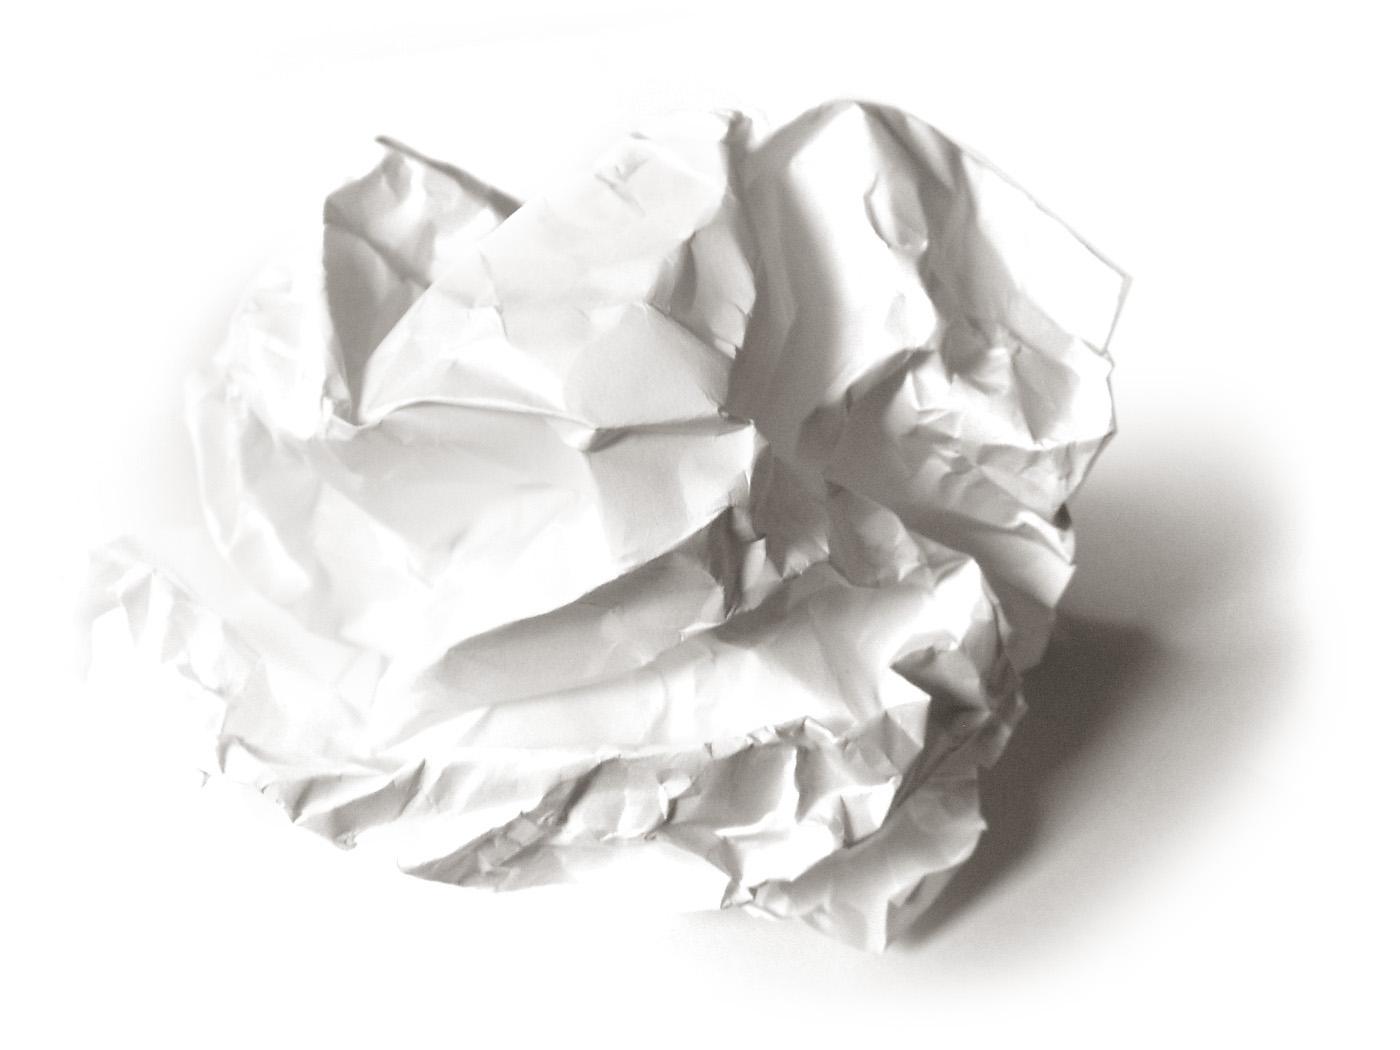 wrinkled-crumpled-paper-1196323